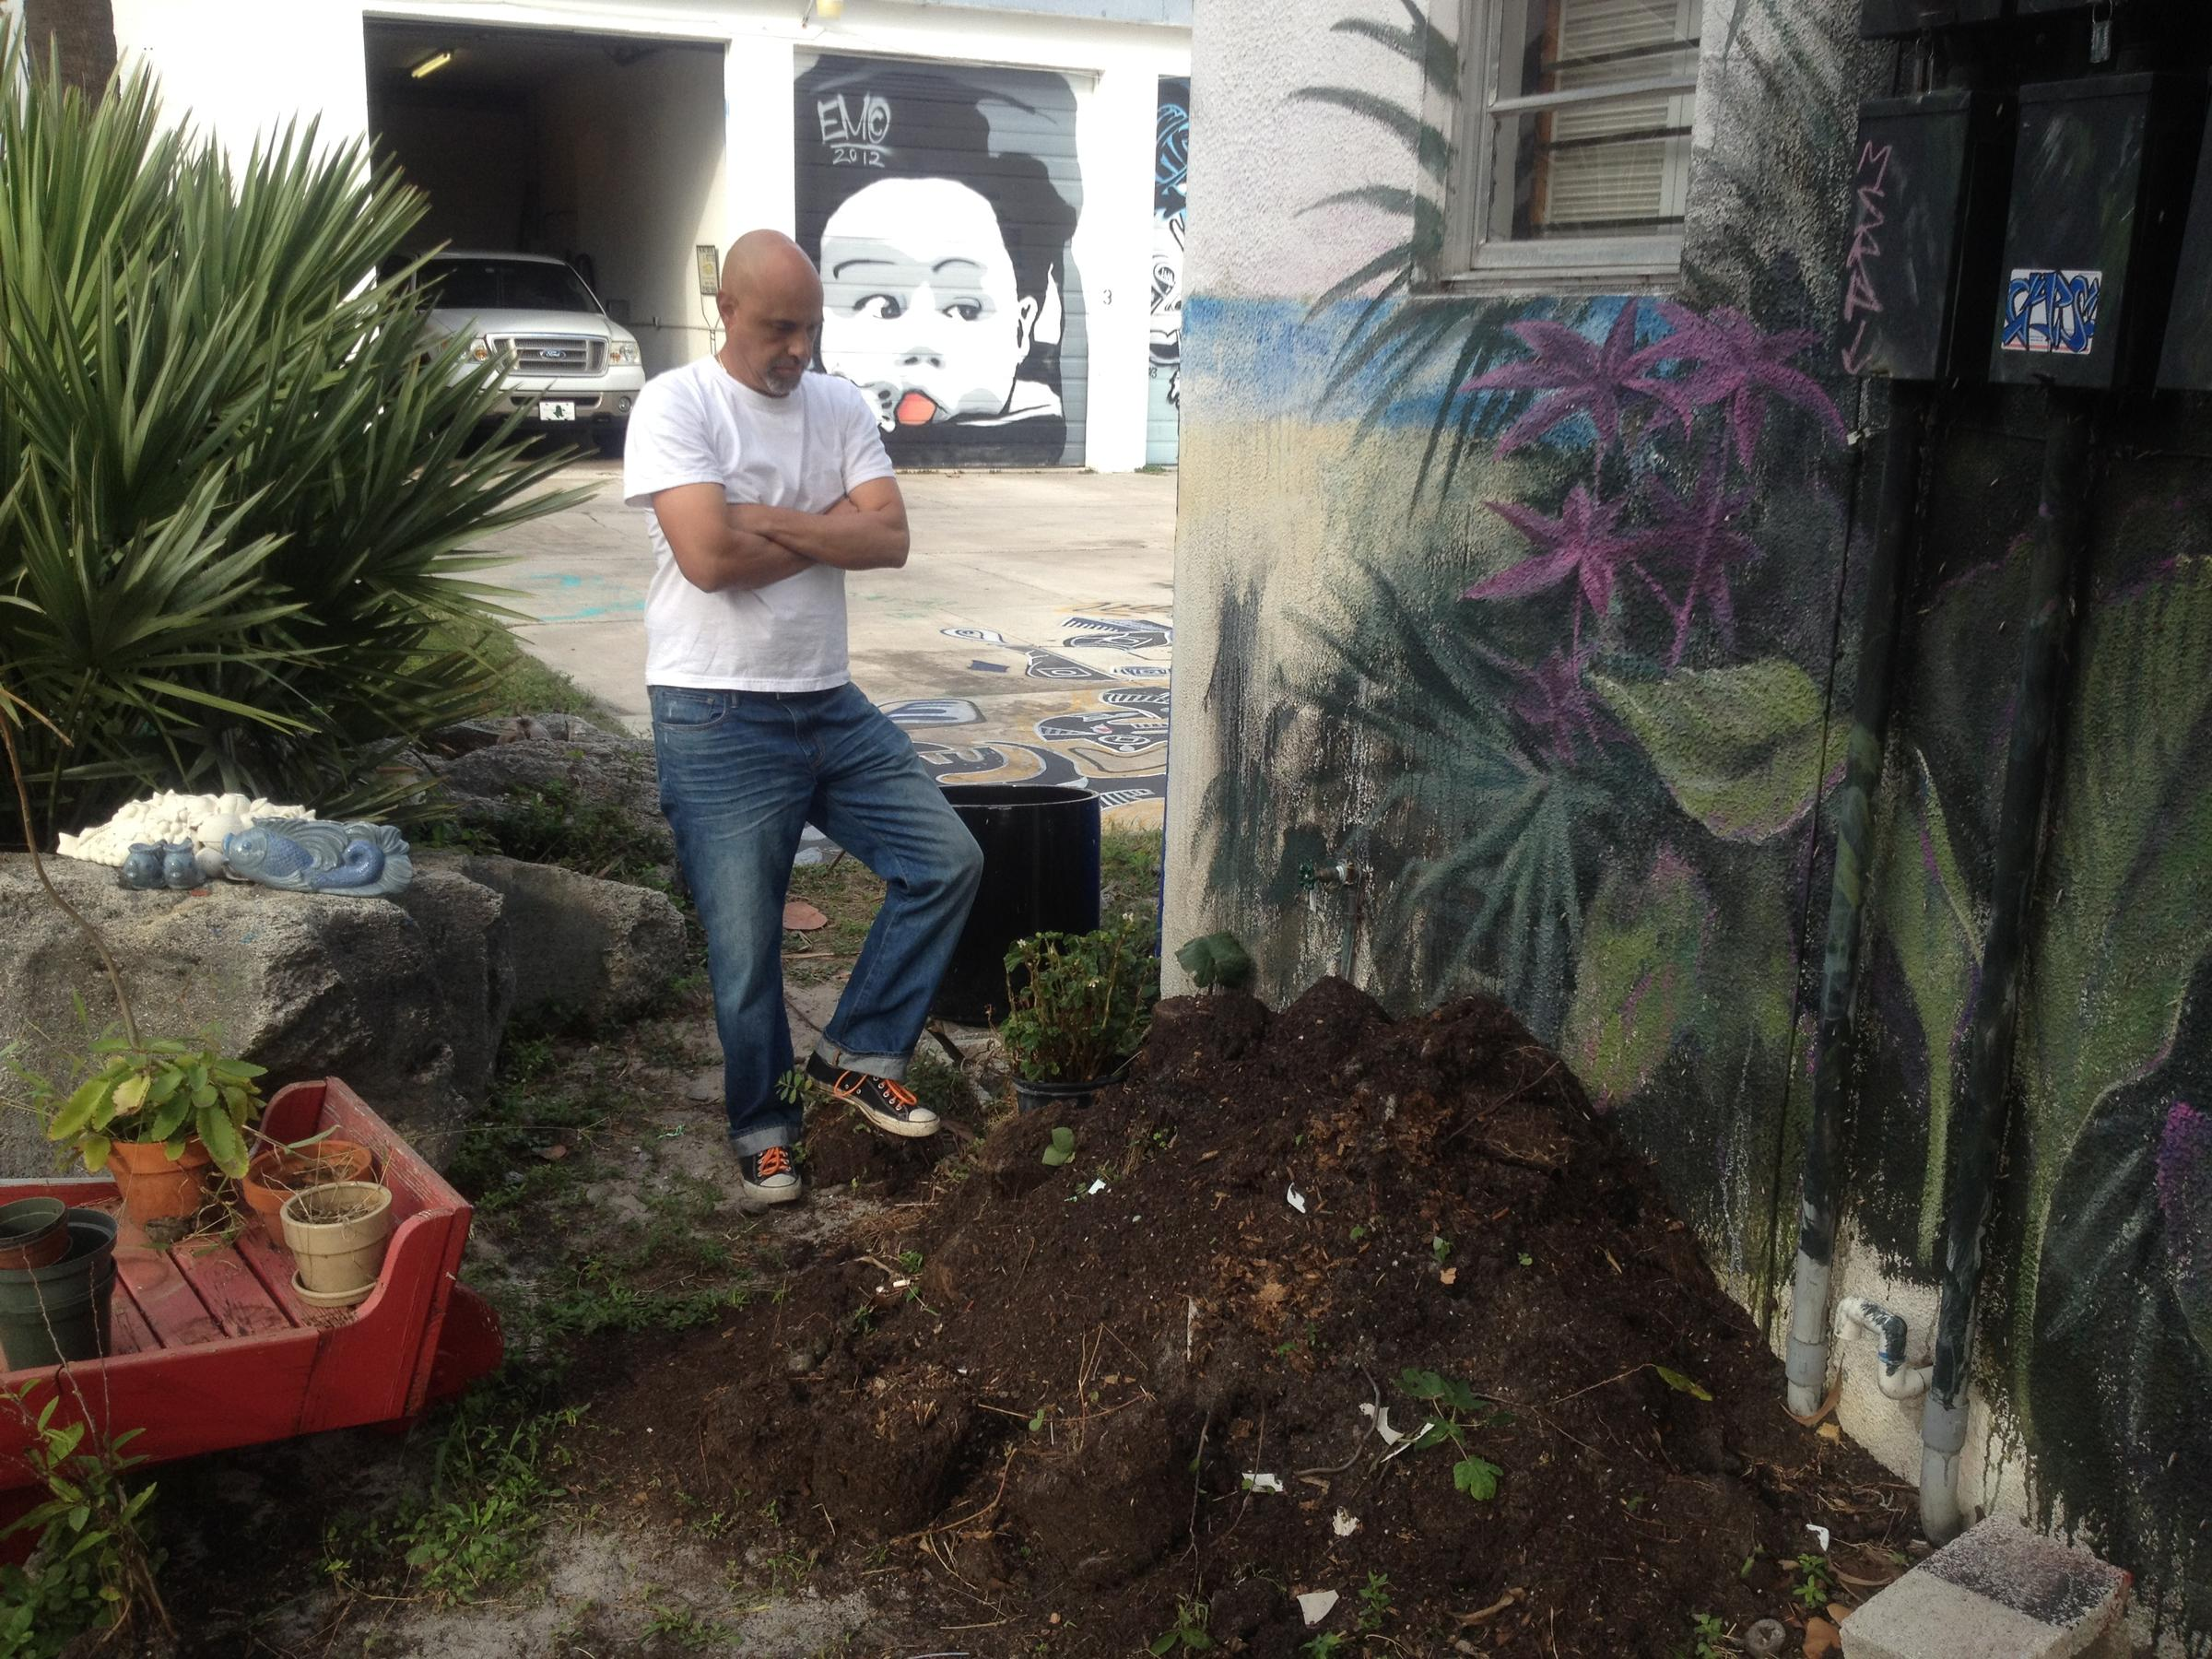 boynton beach arts district picks up the pieces after flood loss